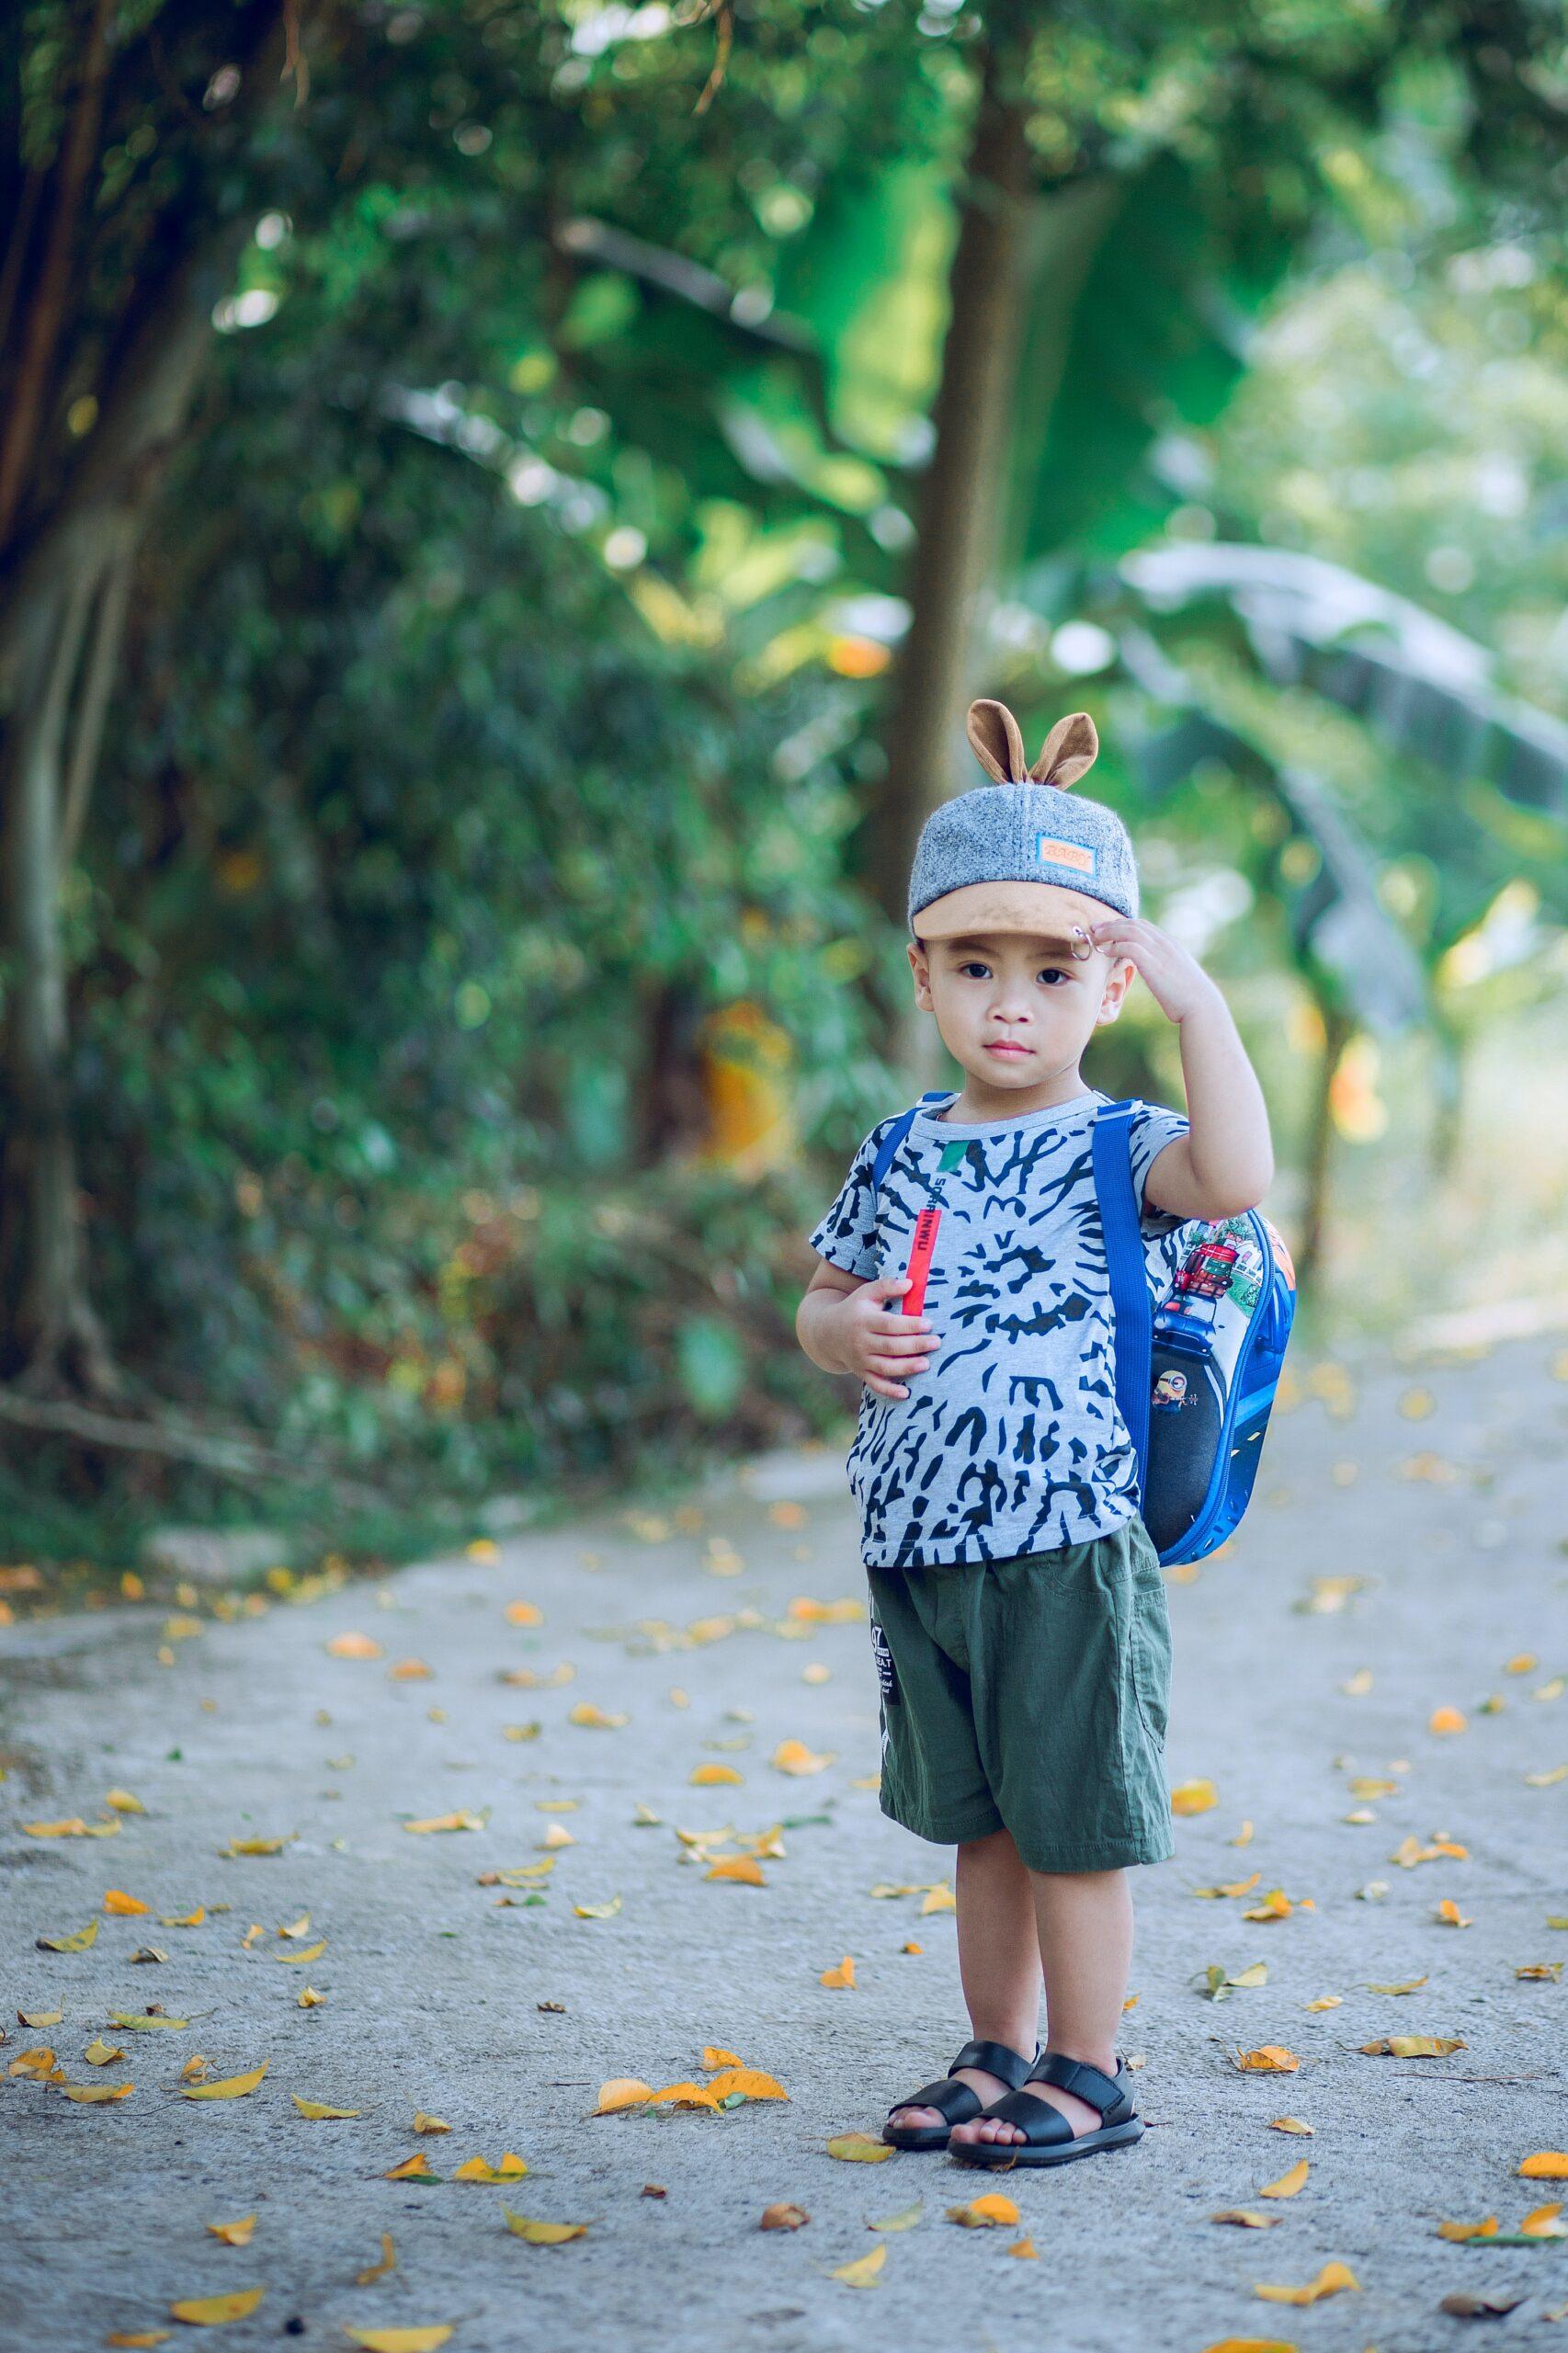 preschooler wearing a backpack